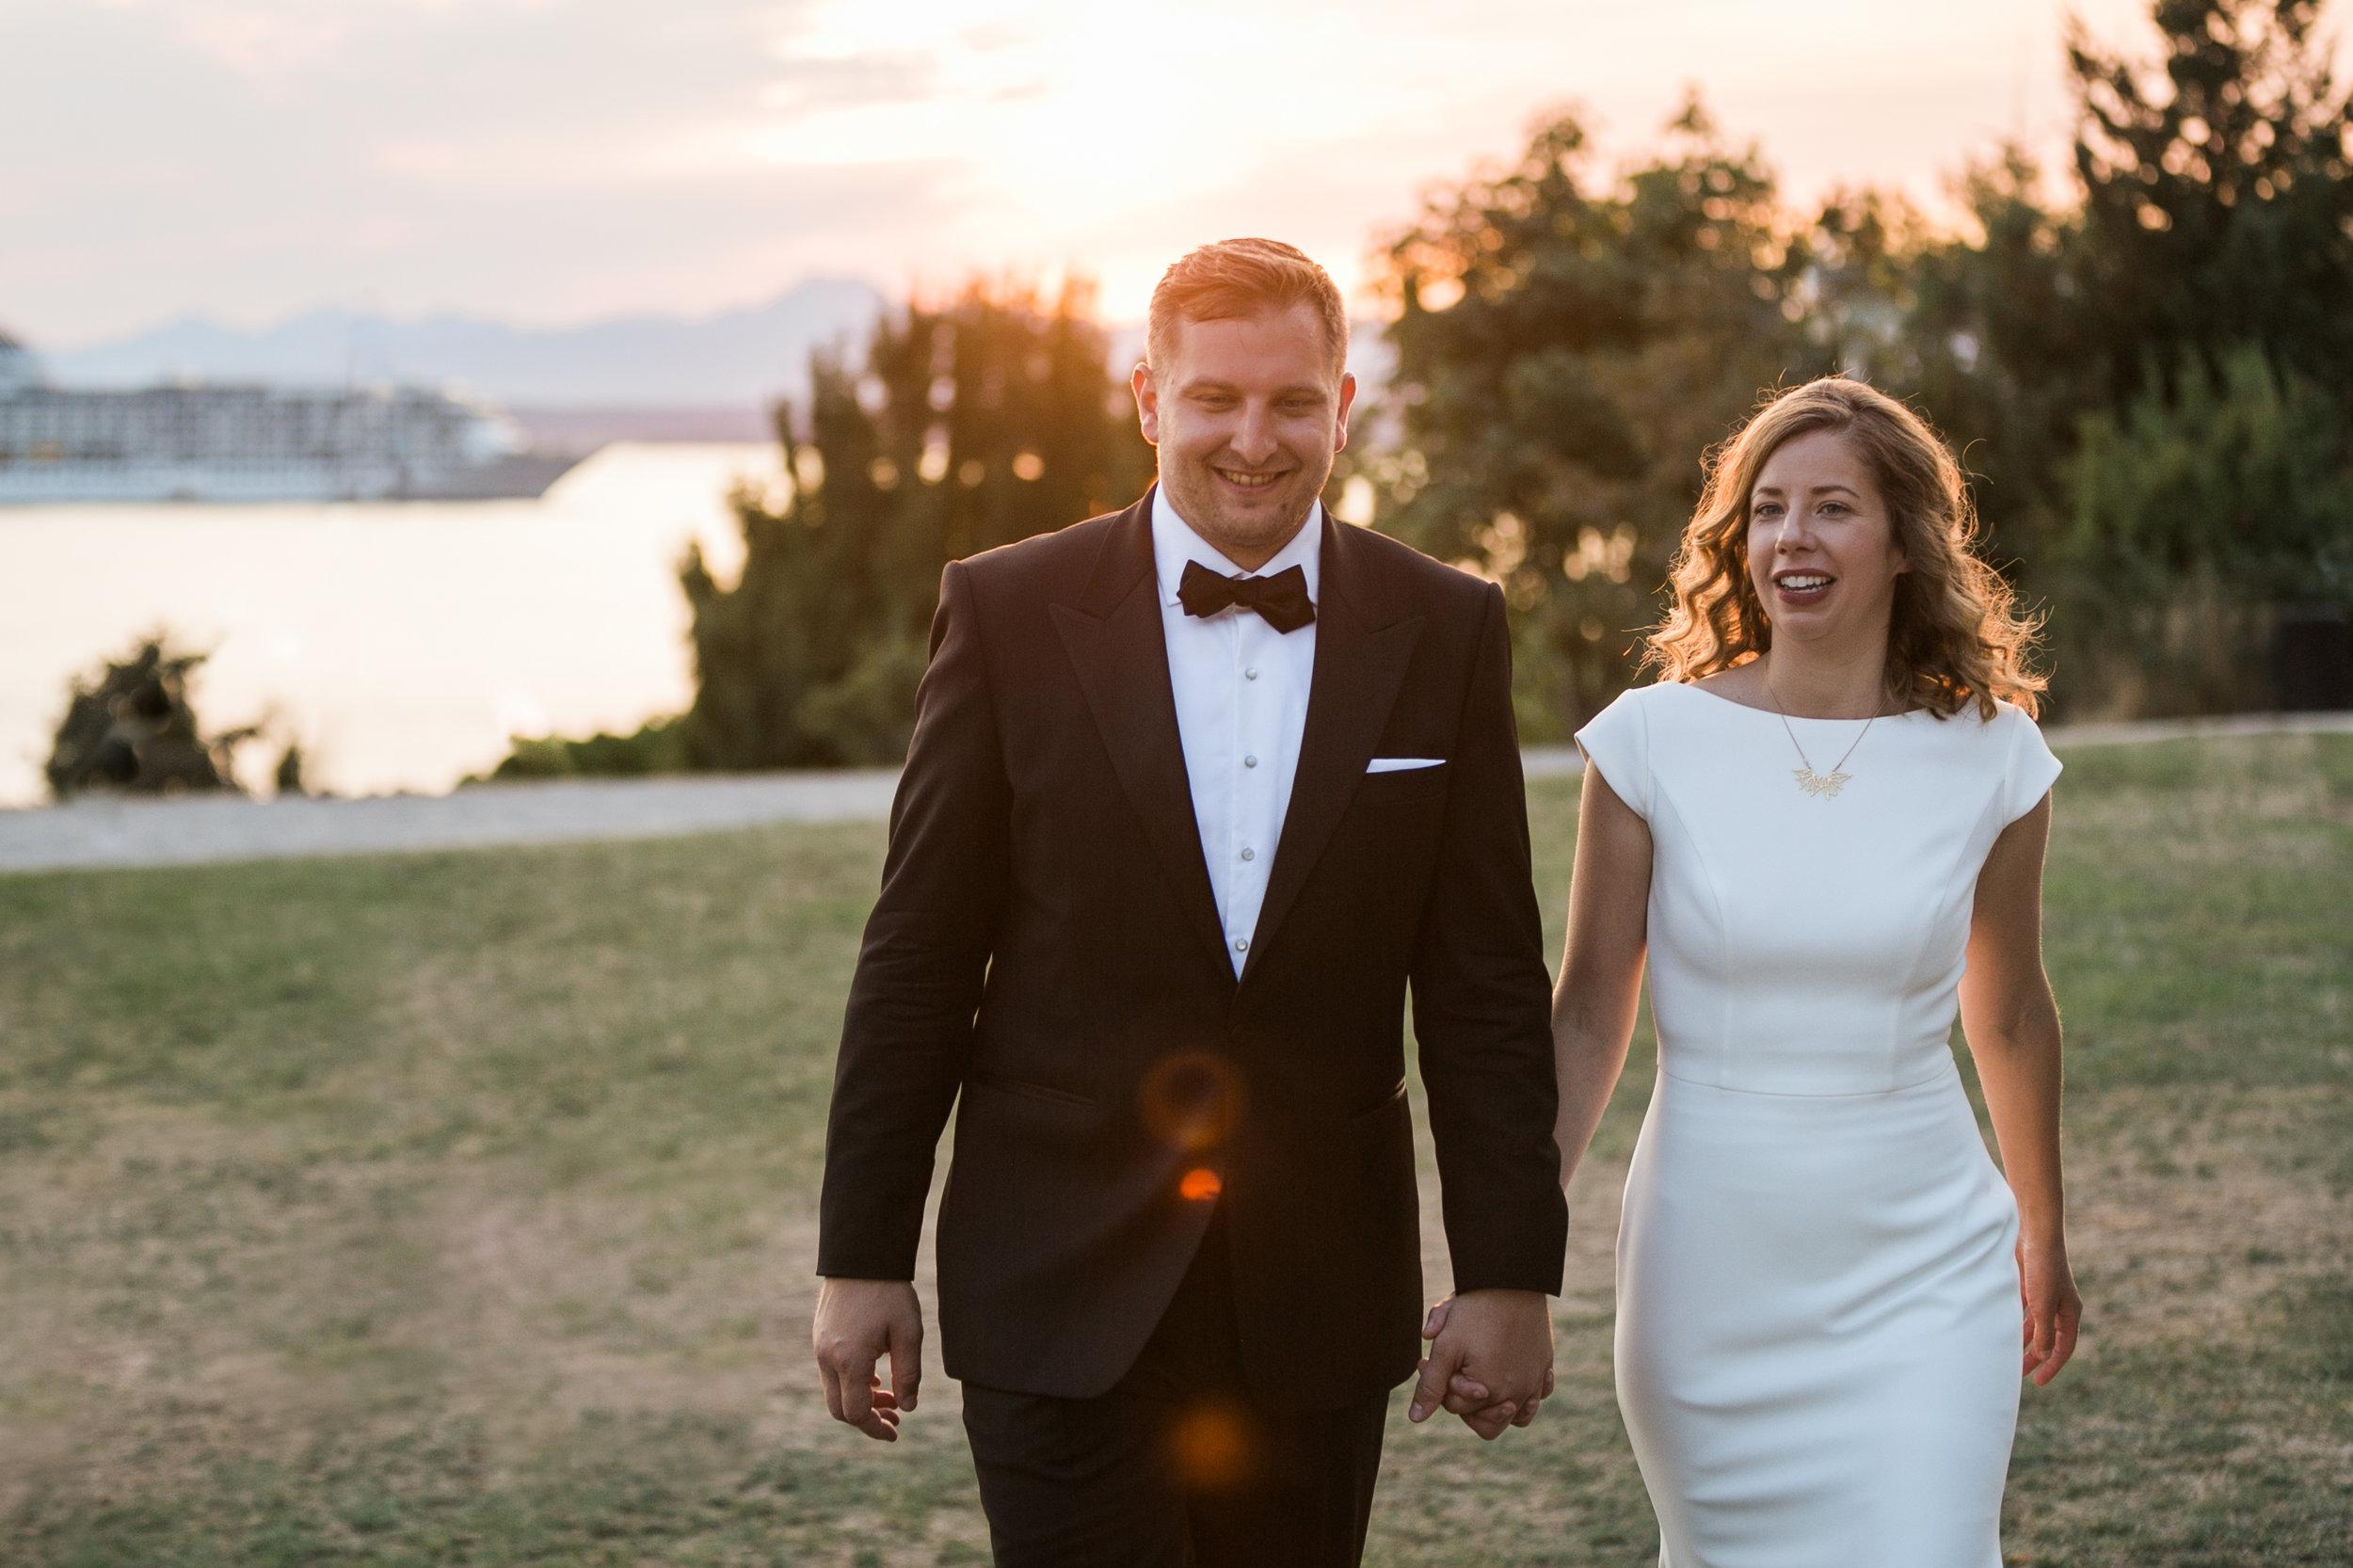 seattle-wedding-sunset-married-outdoors-northwest-couple-bride-groom-romantic